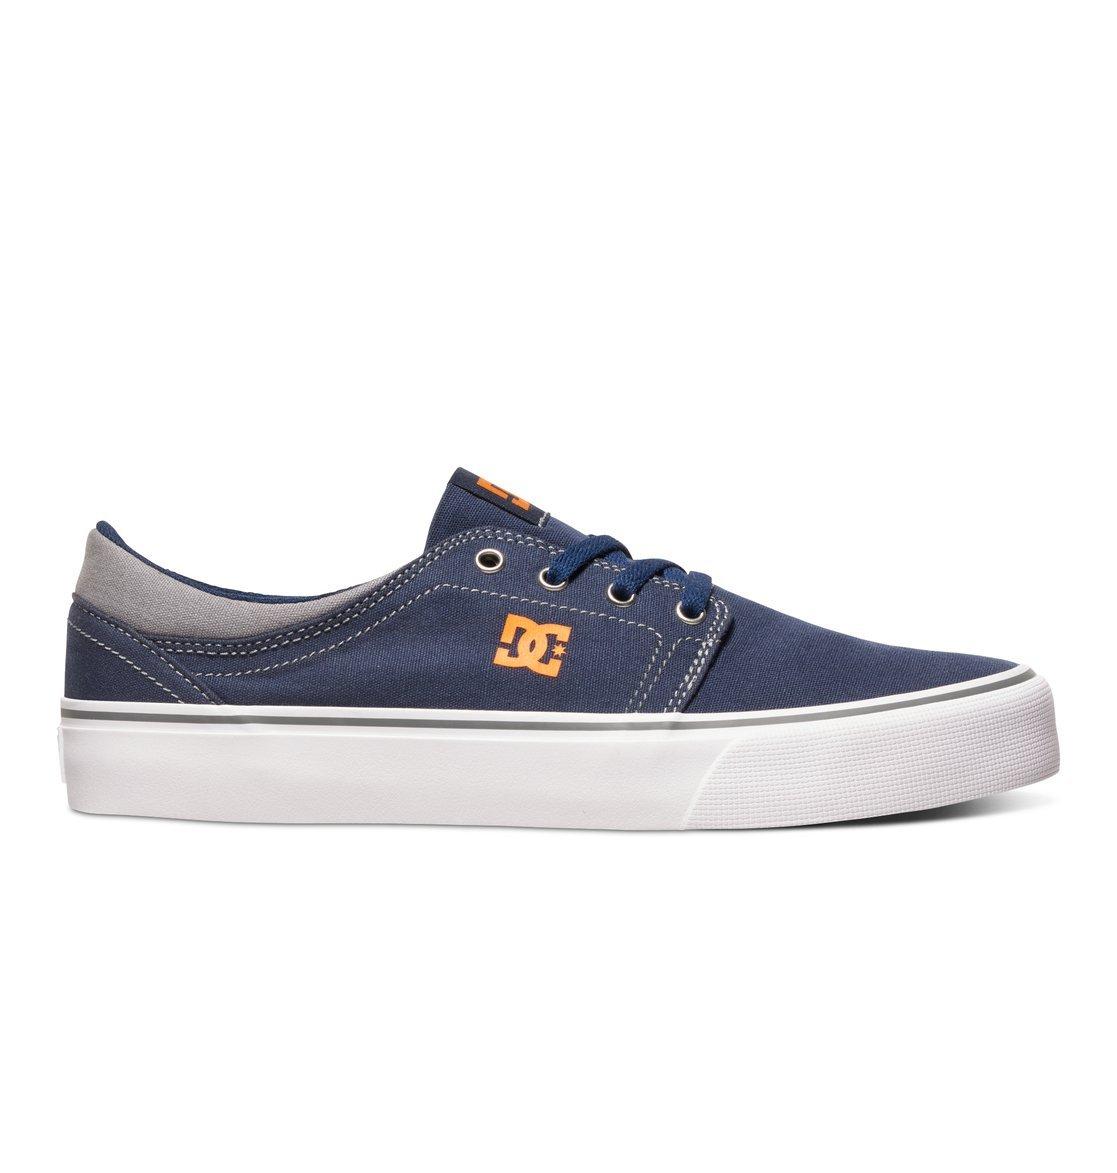 DC Men's Trase TX Unisex Skate Shoe B01D22GT84 6 B(M) US|Navy/Orange